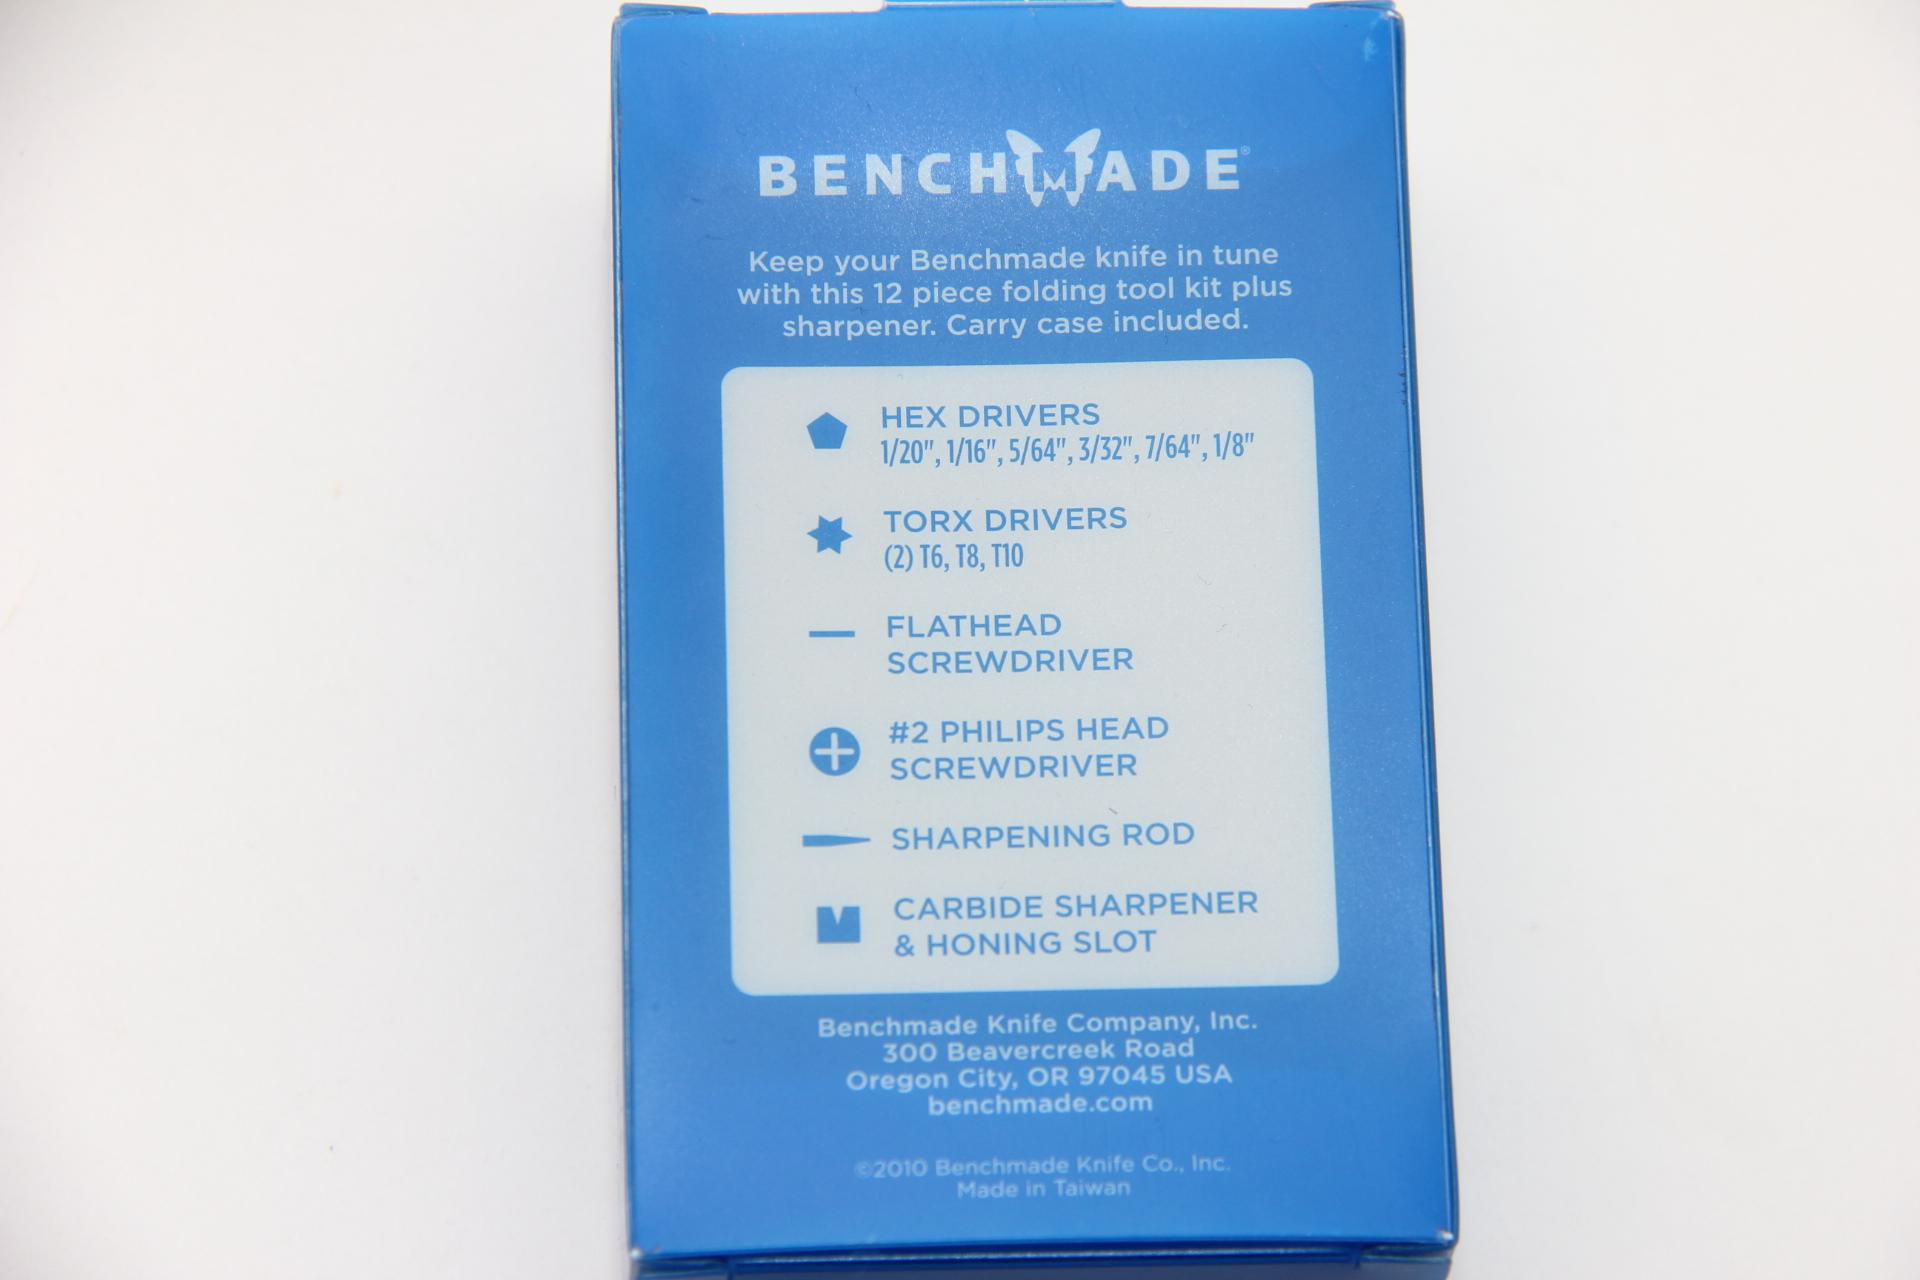 Benchmade Lonewolf Field Tool Kit универсальный набор